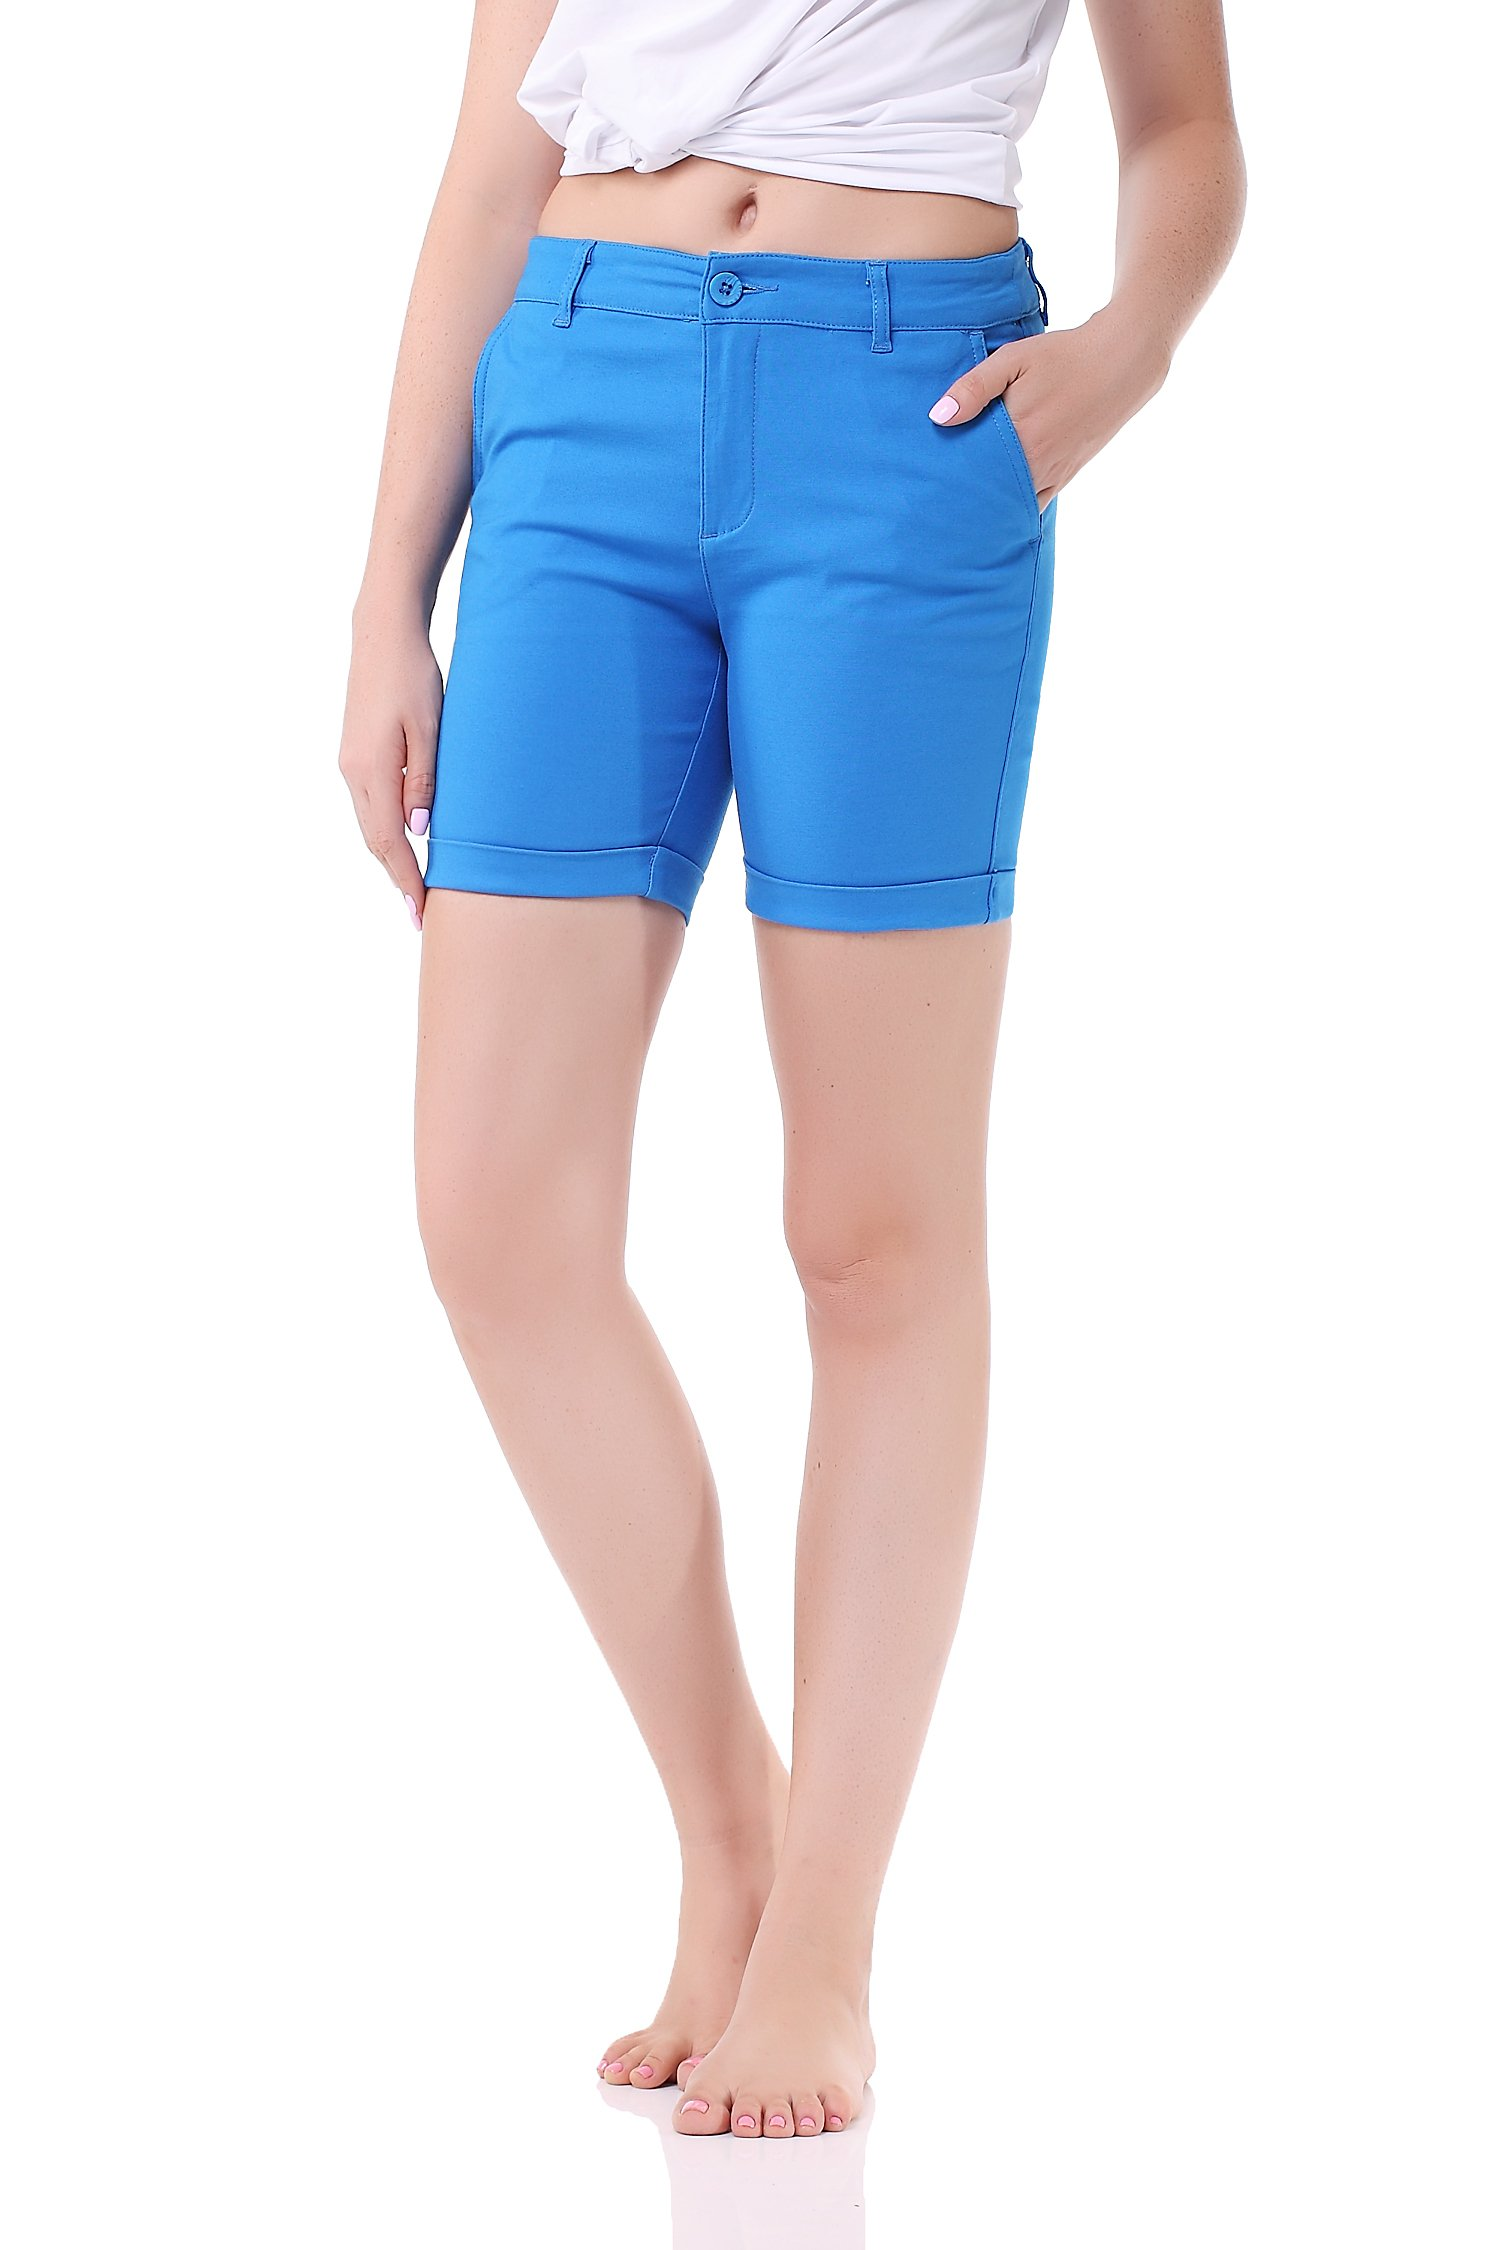 Pau1Hami1ton GP-03 Womens Stretch Bermuda Summer Walking Sport Shorts (L,Blue)